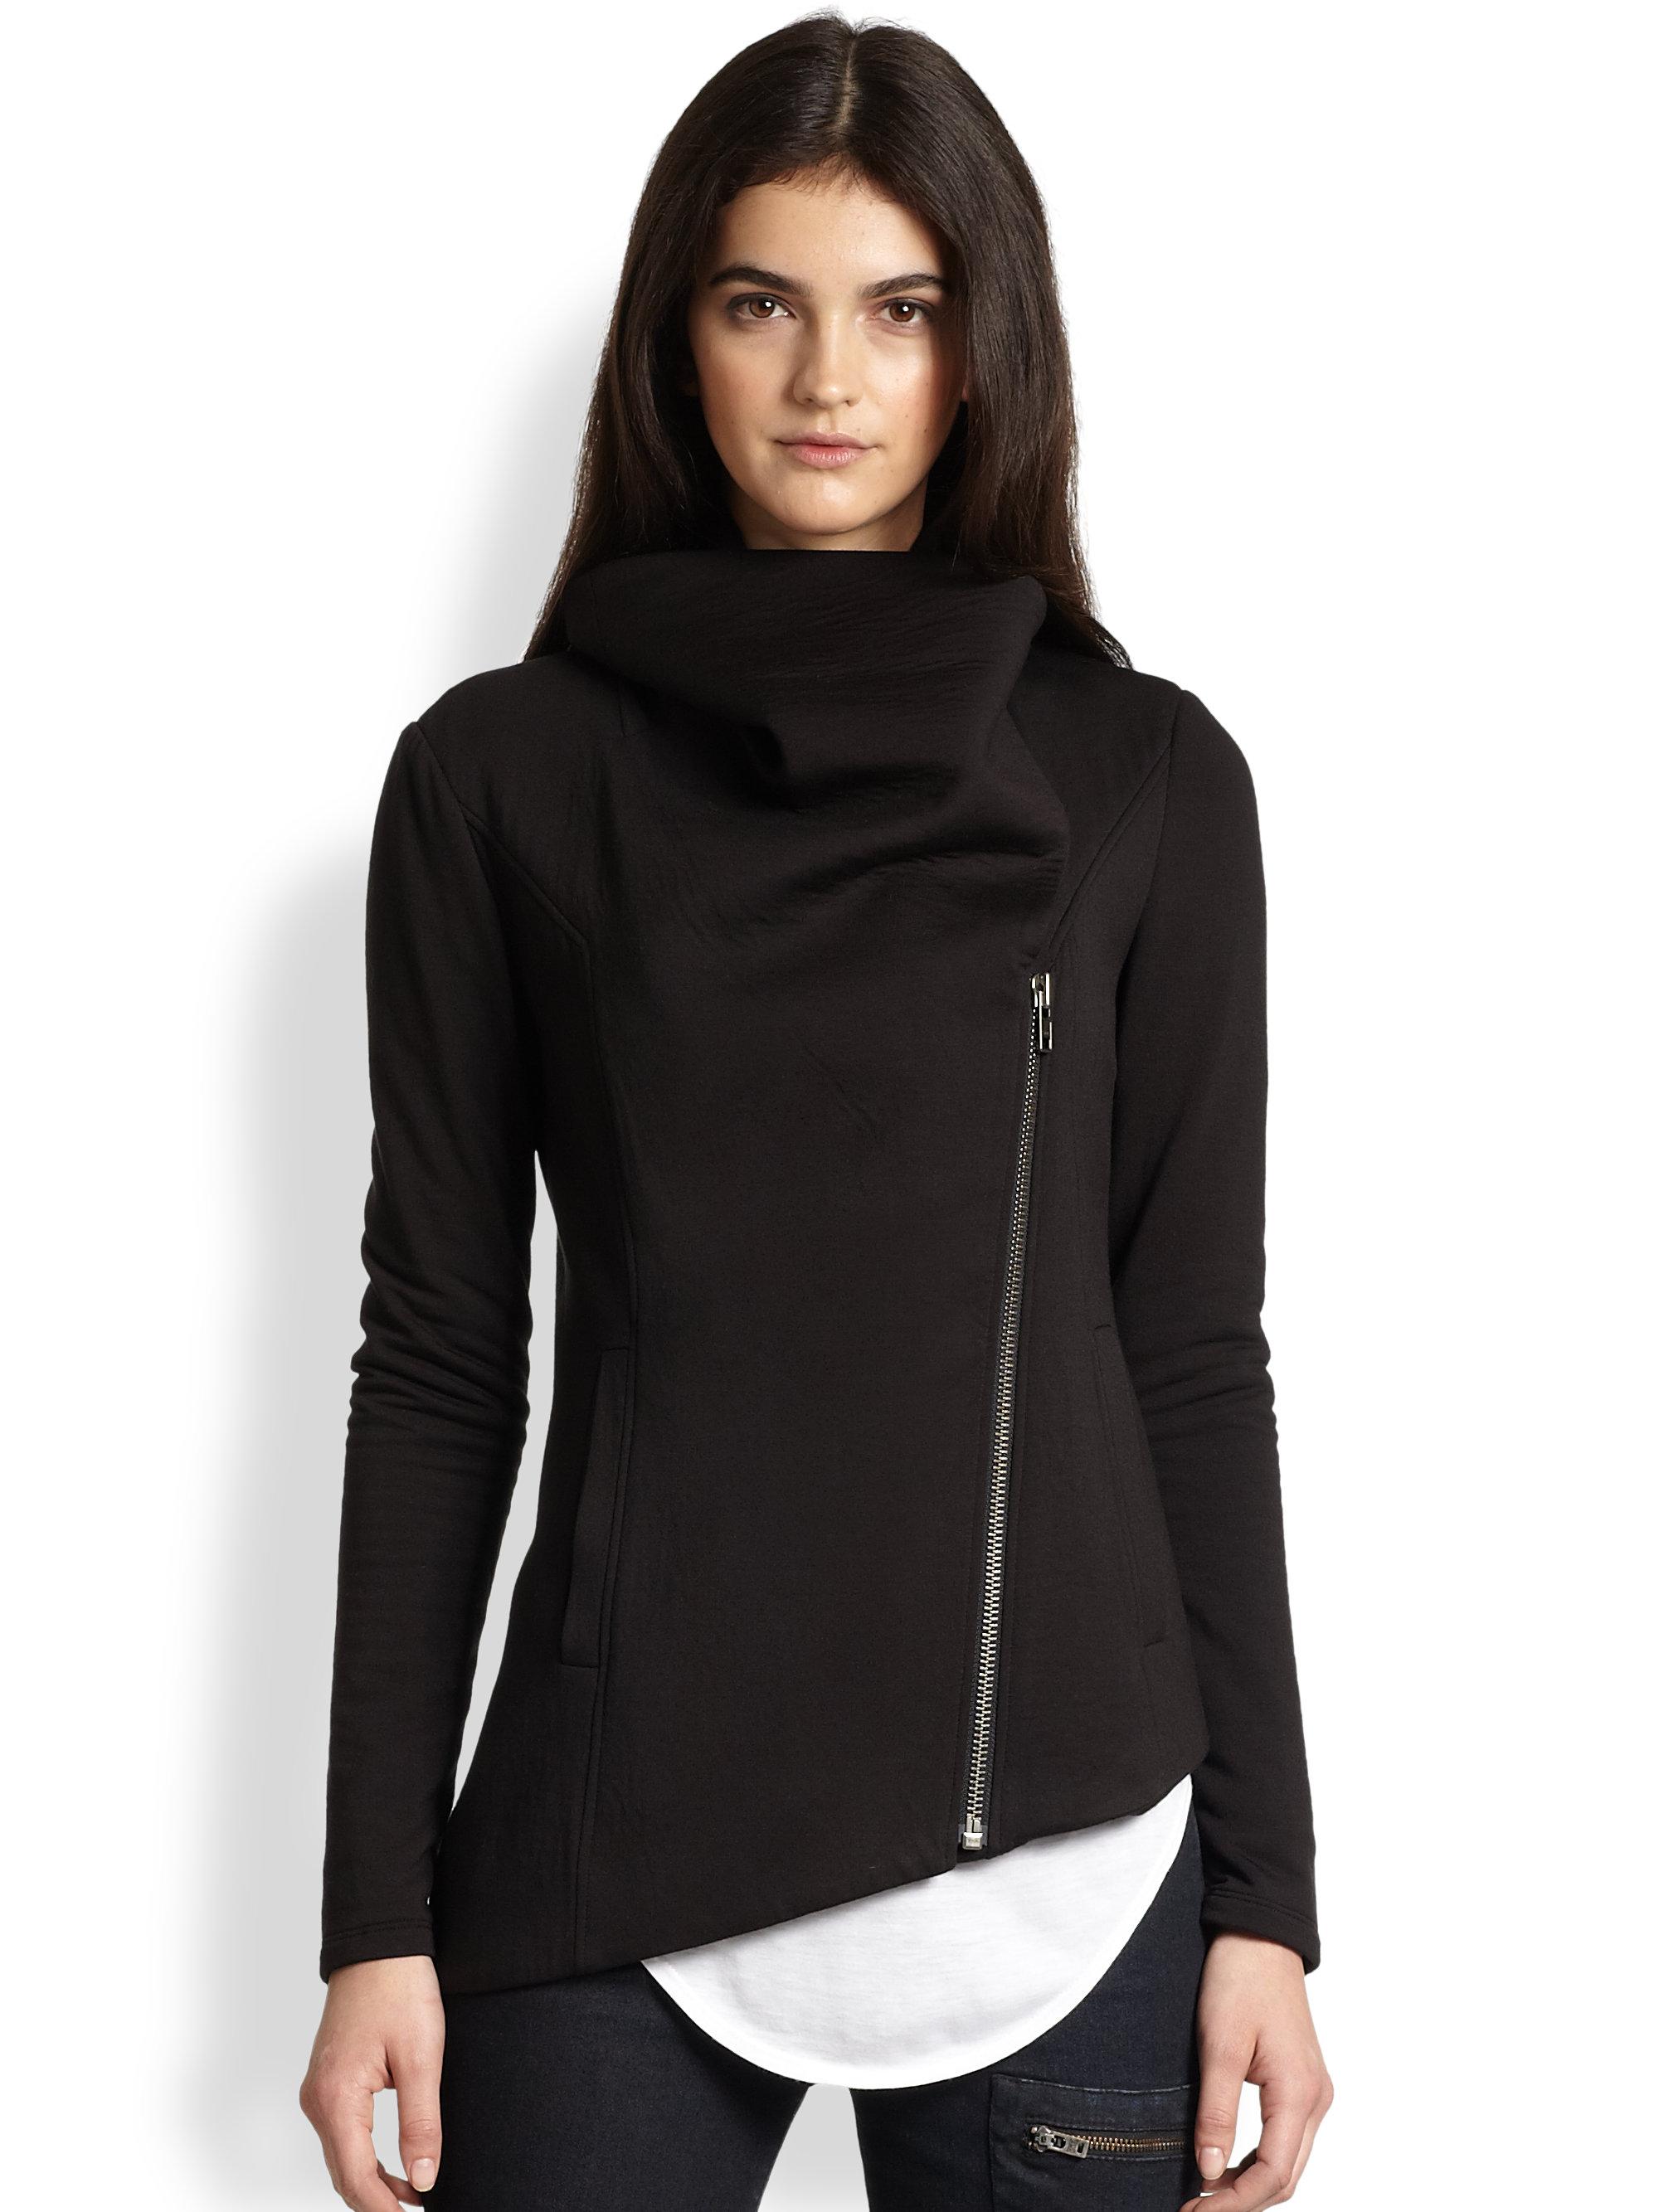 Helmut Lang Helmut Villous Asymmetrical Sweatshirt in ...